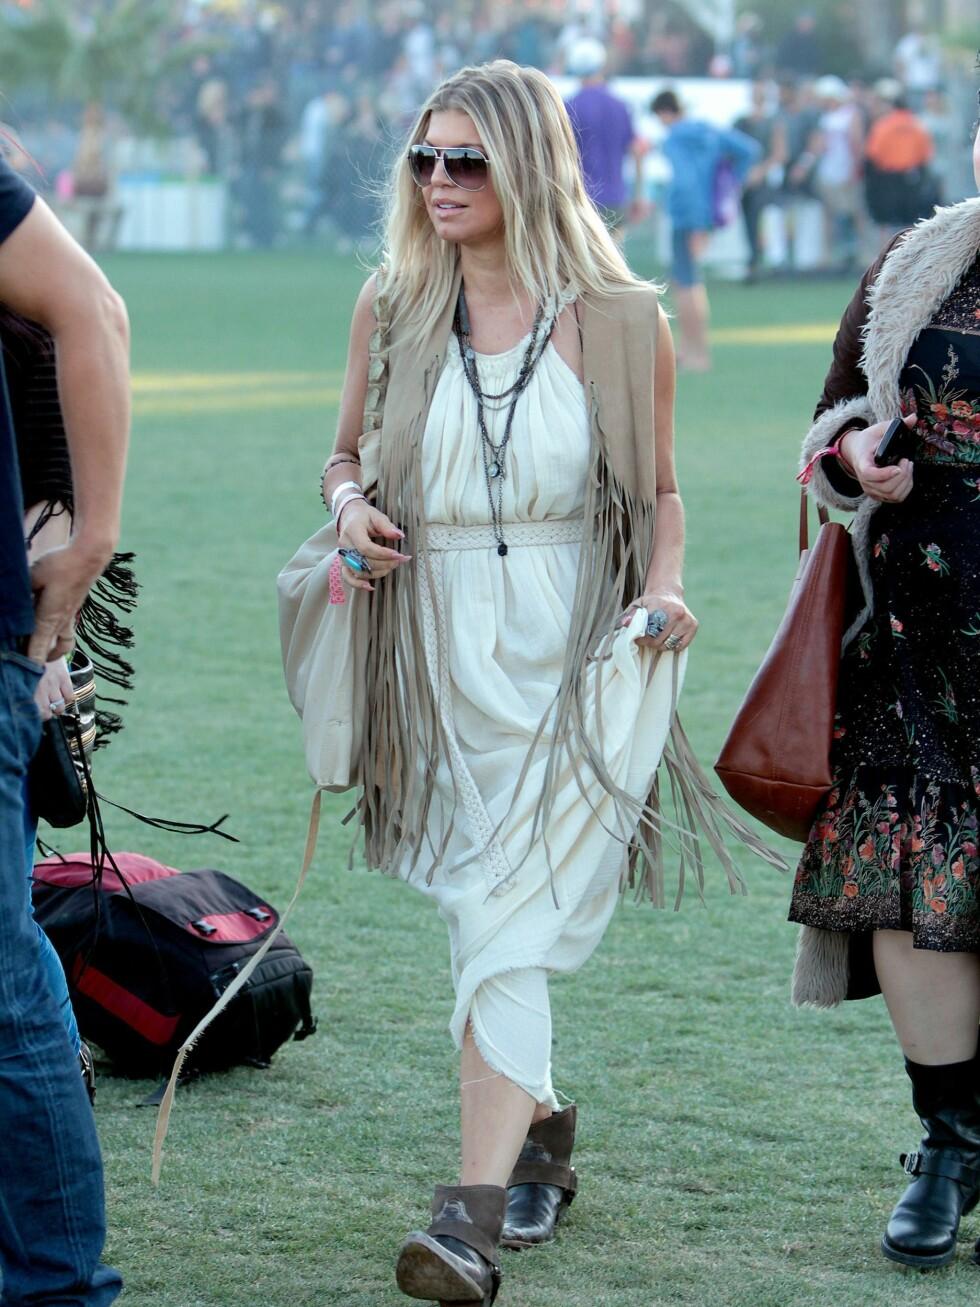 Popstjerne Fergie på festival i hvit hippieinspirert kjole, beige frynsevest og cowboyboots.  Foto: All Over Press